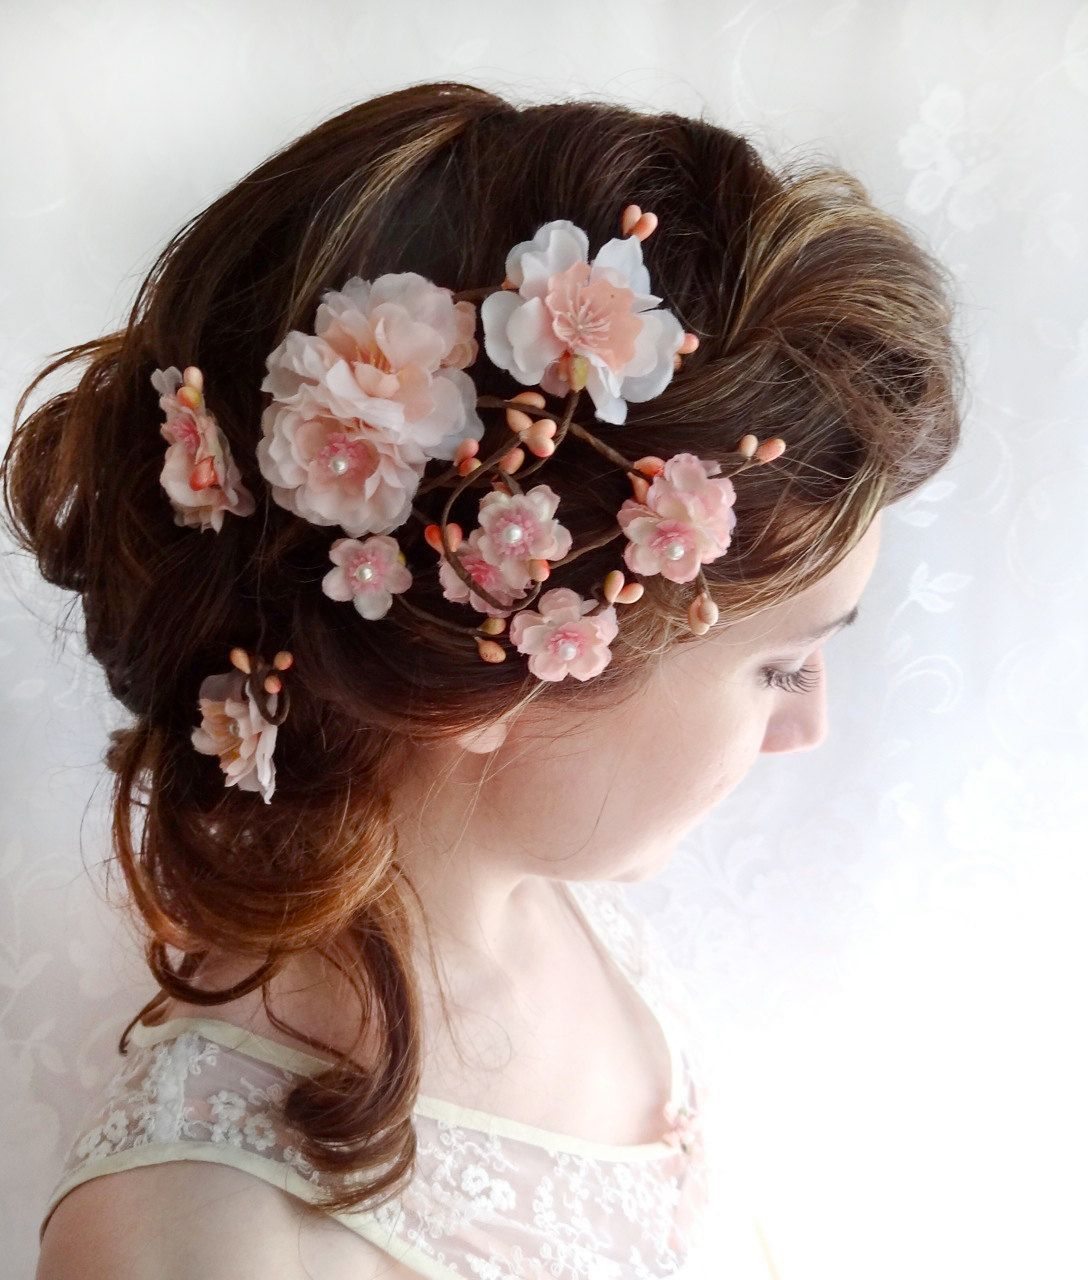 blush pink hair flower, wedding hair accessories, bridal hair clip, MISAKI - cherry blossom headpiece. $85.00, via Etsy.